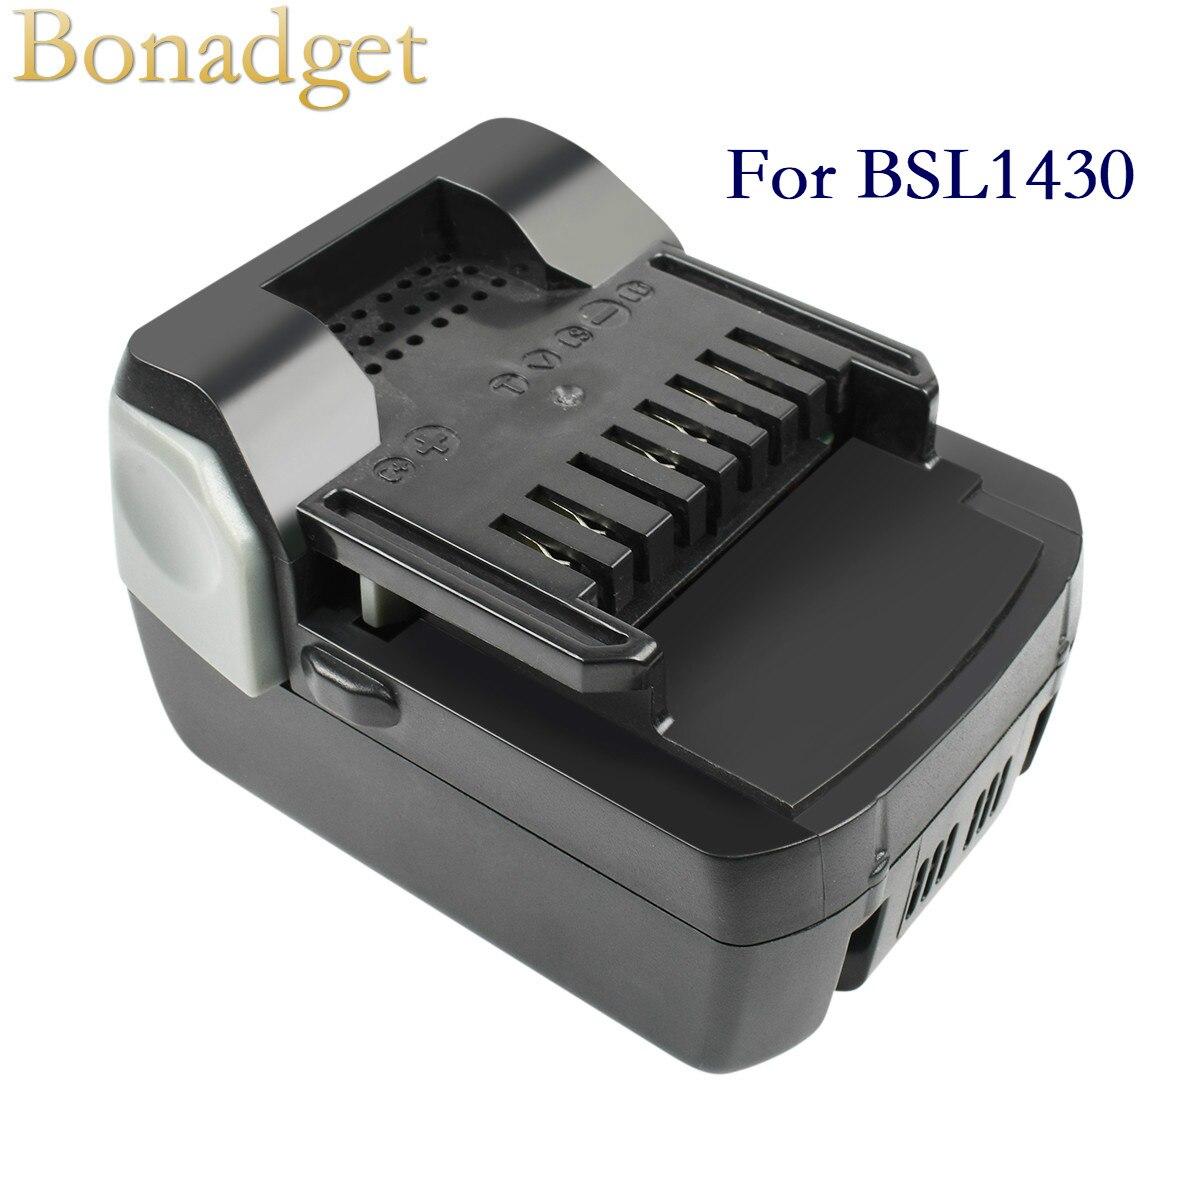 Bonadget 4000mAh 6000mAh 14.4V Batteria נטענת סוללה עבור Hitachi BSL1430 BSL1415 C14DSL CD14DSL כלי חשמל סוללה